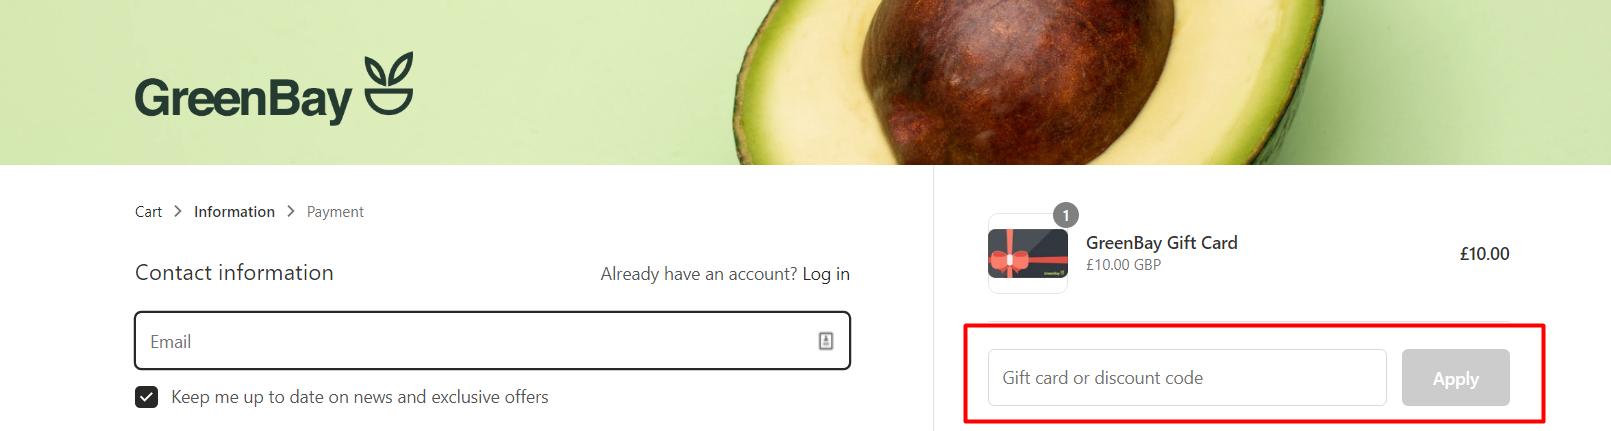 How do I use my GreenBay discount code?